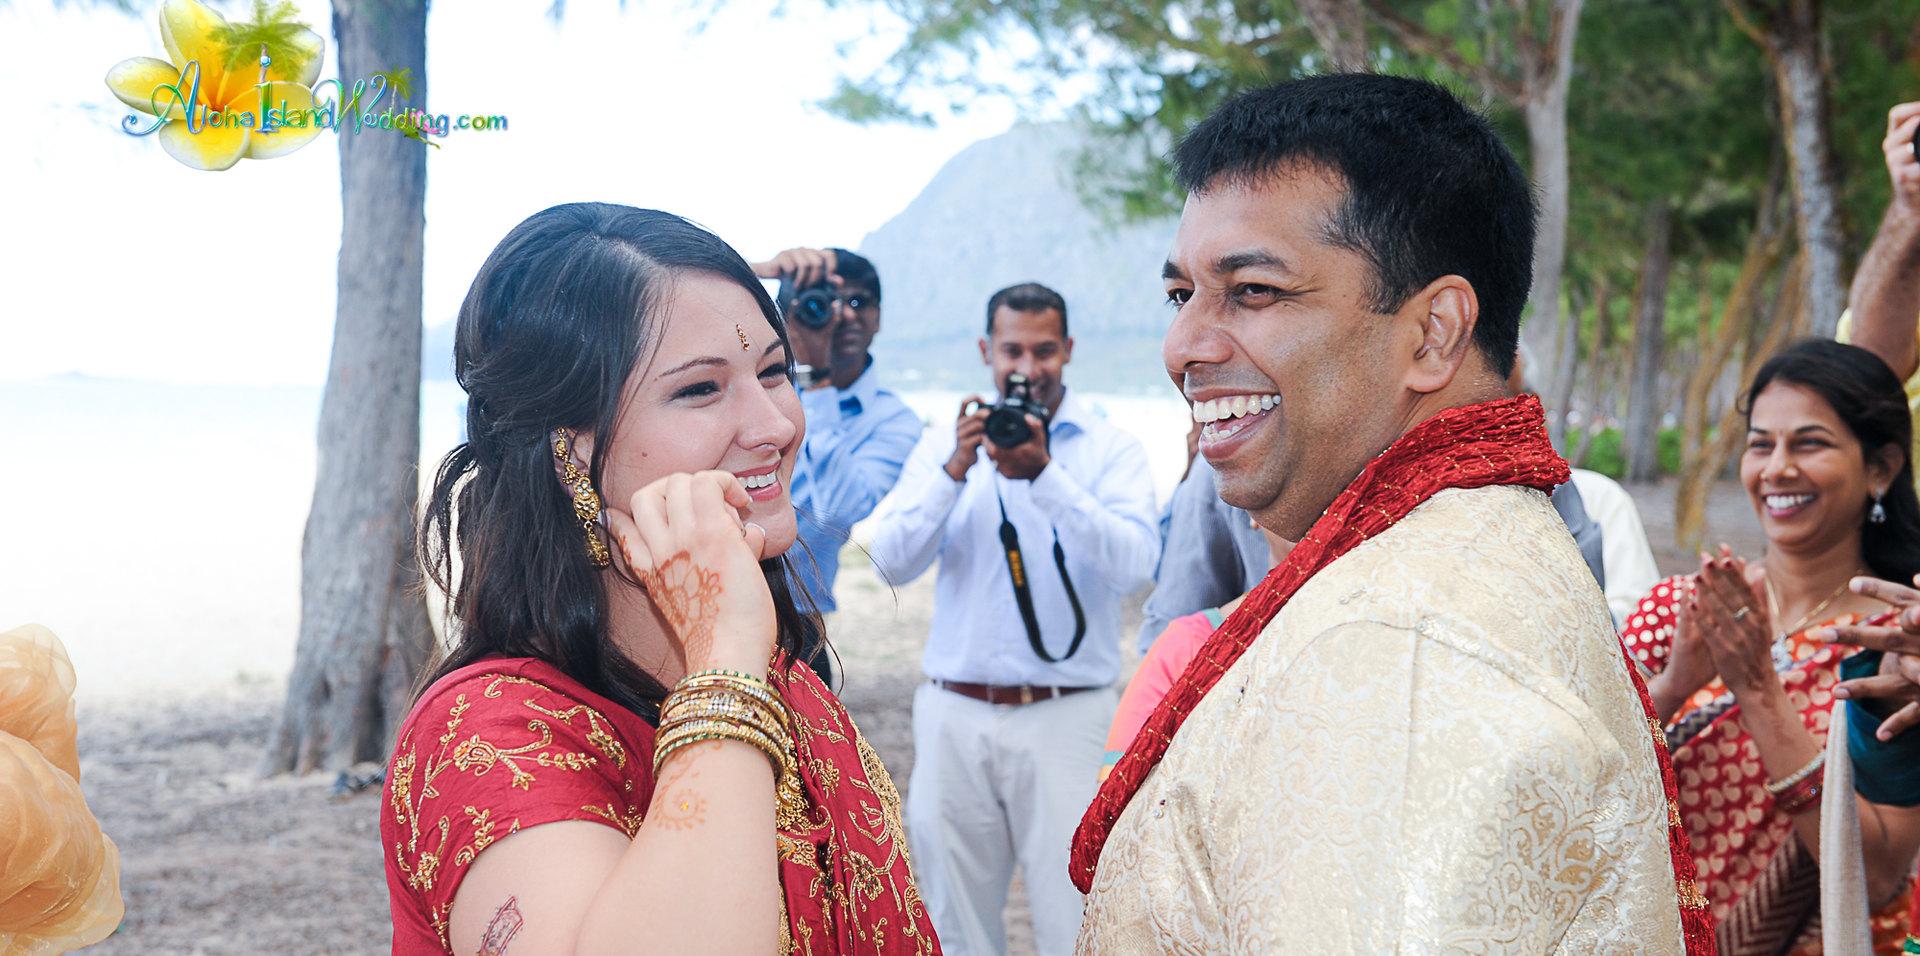 Indian wedding ceremony in hawaii-52.jpg